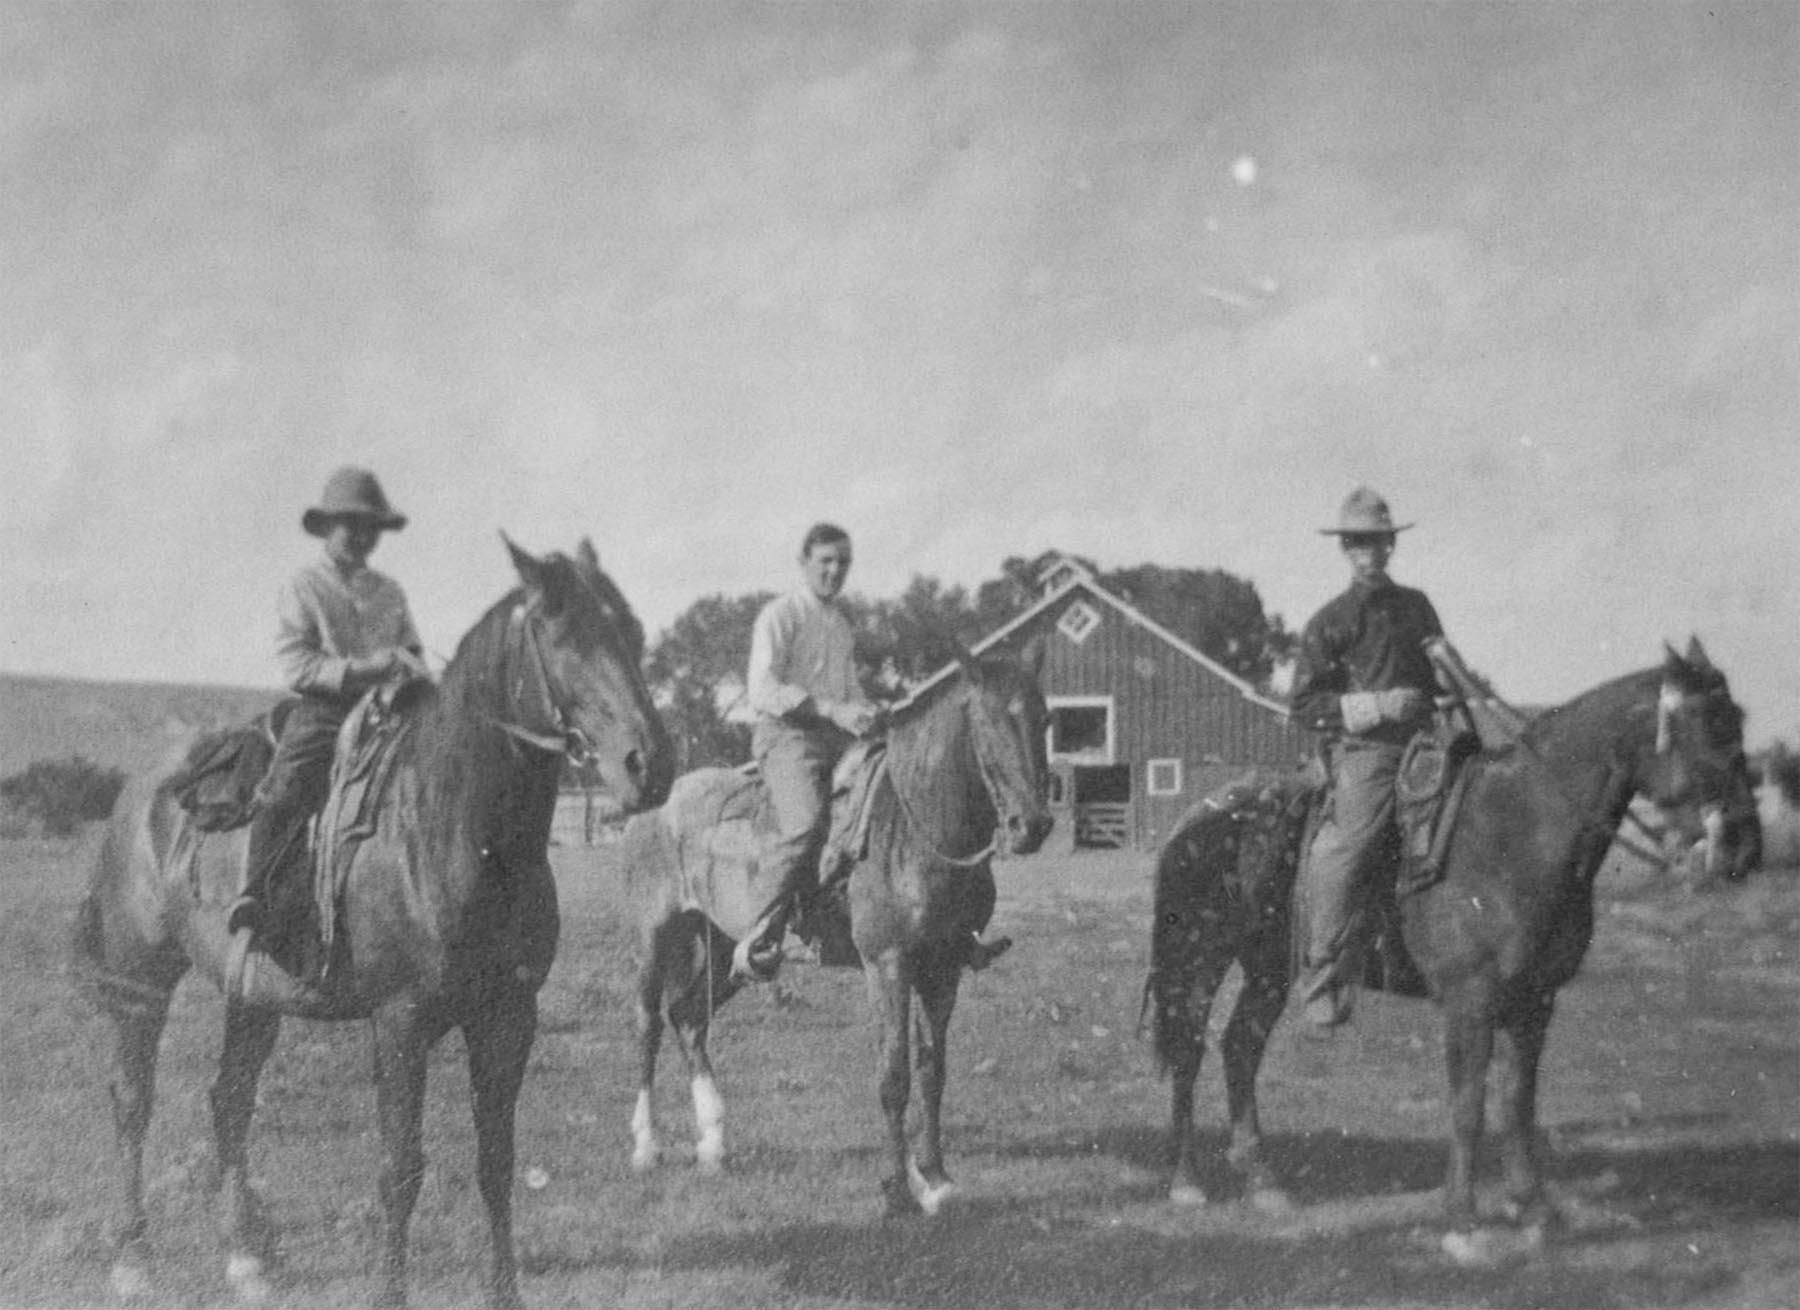 Wagonhound Ranch History